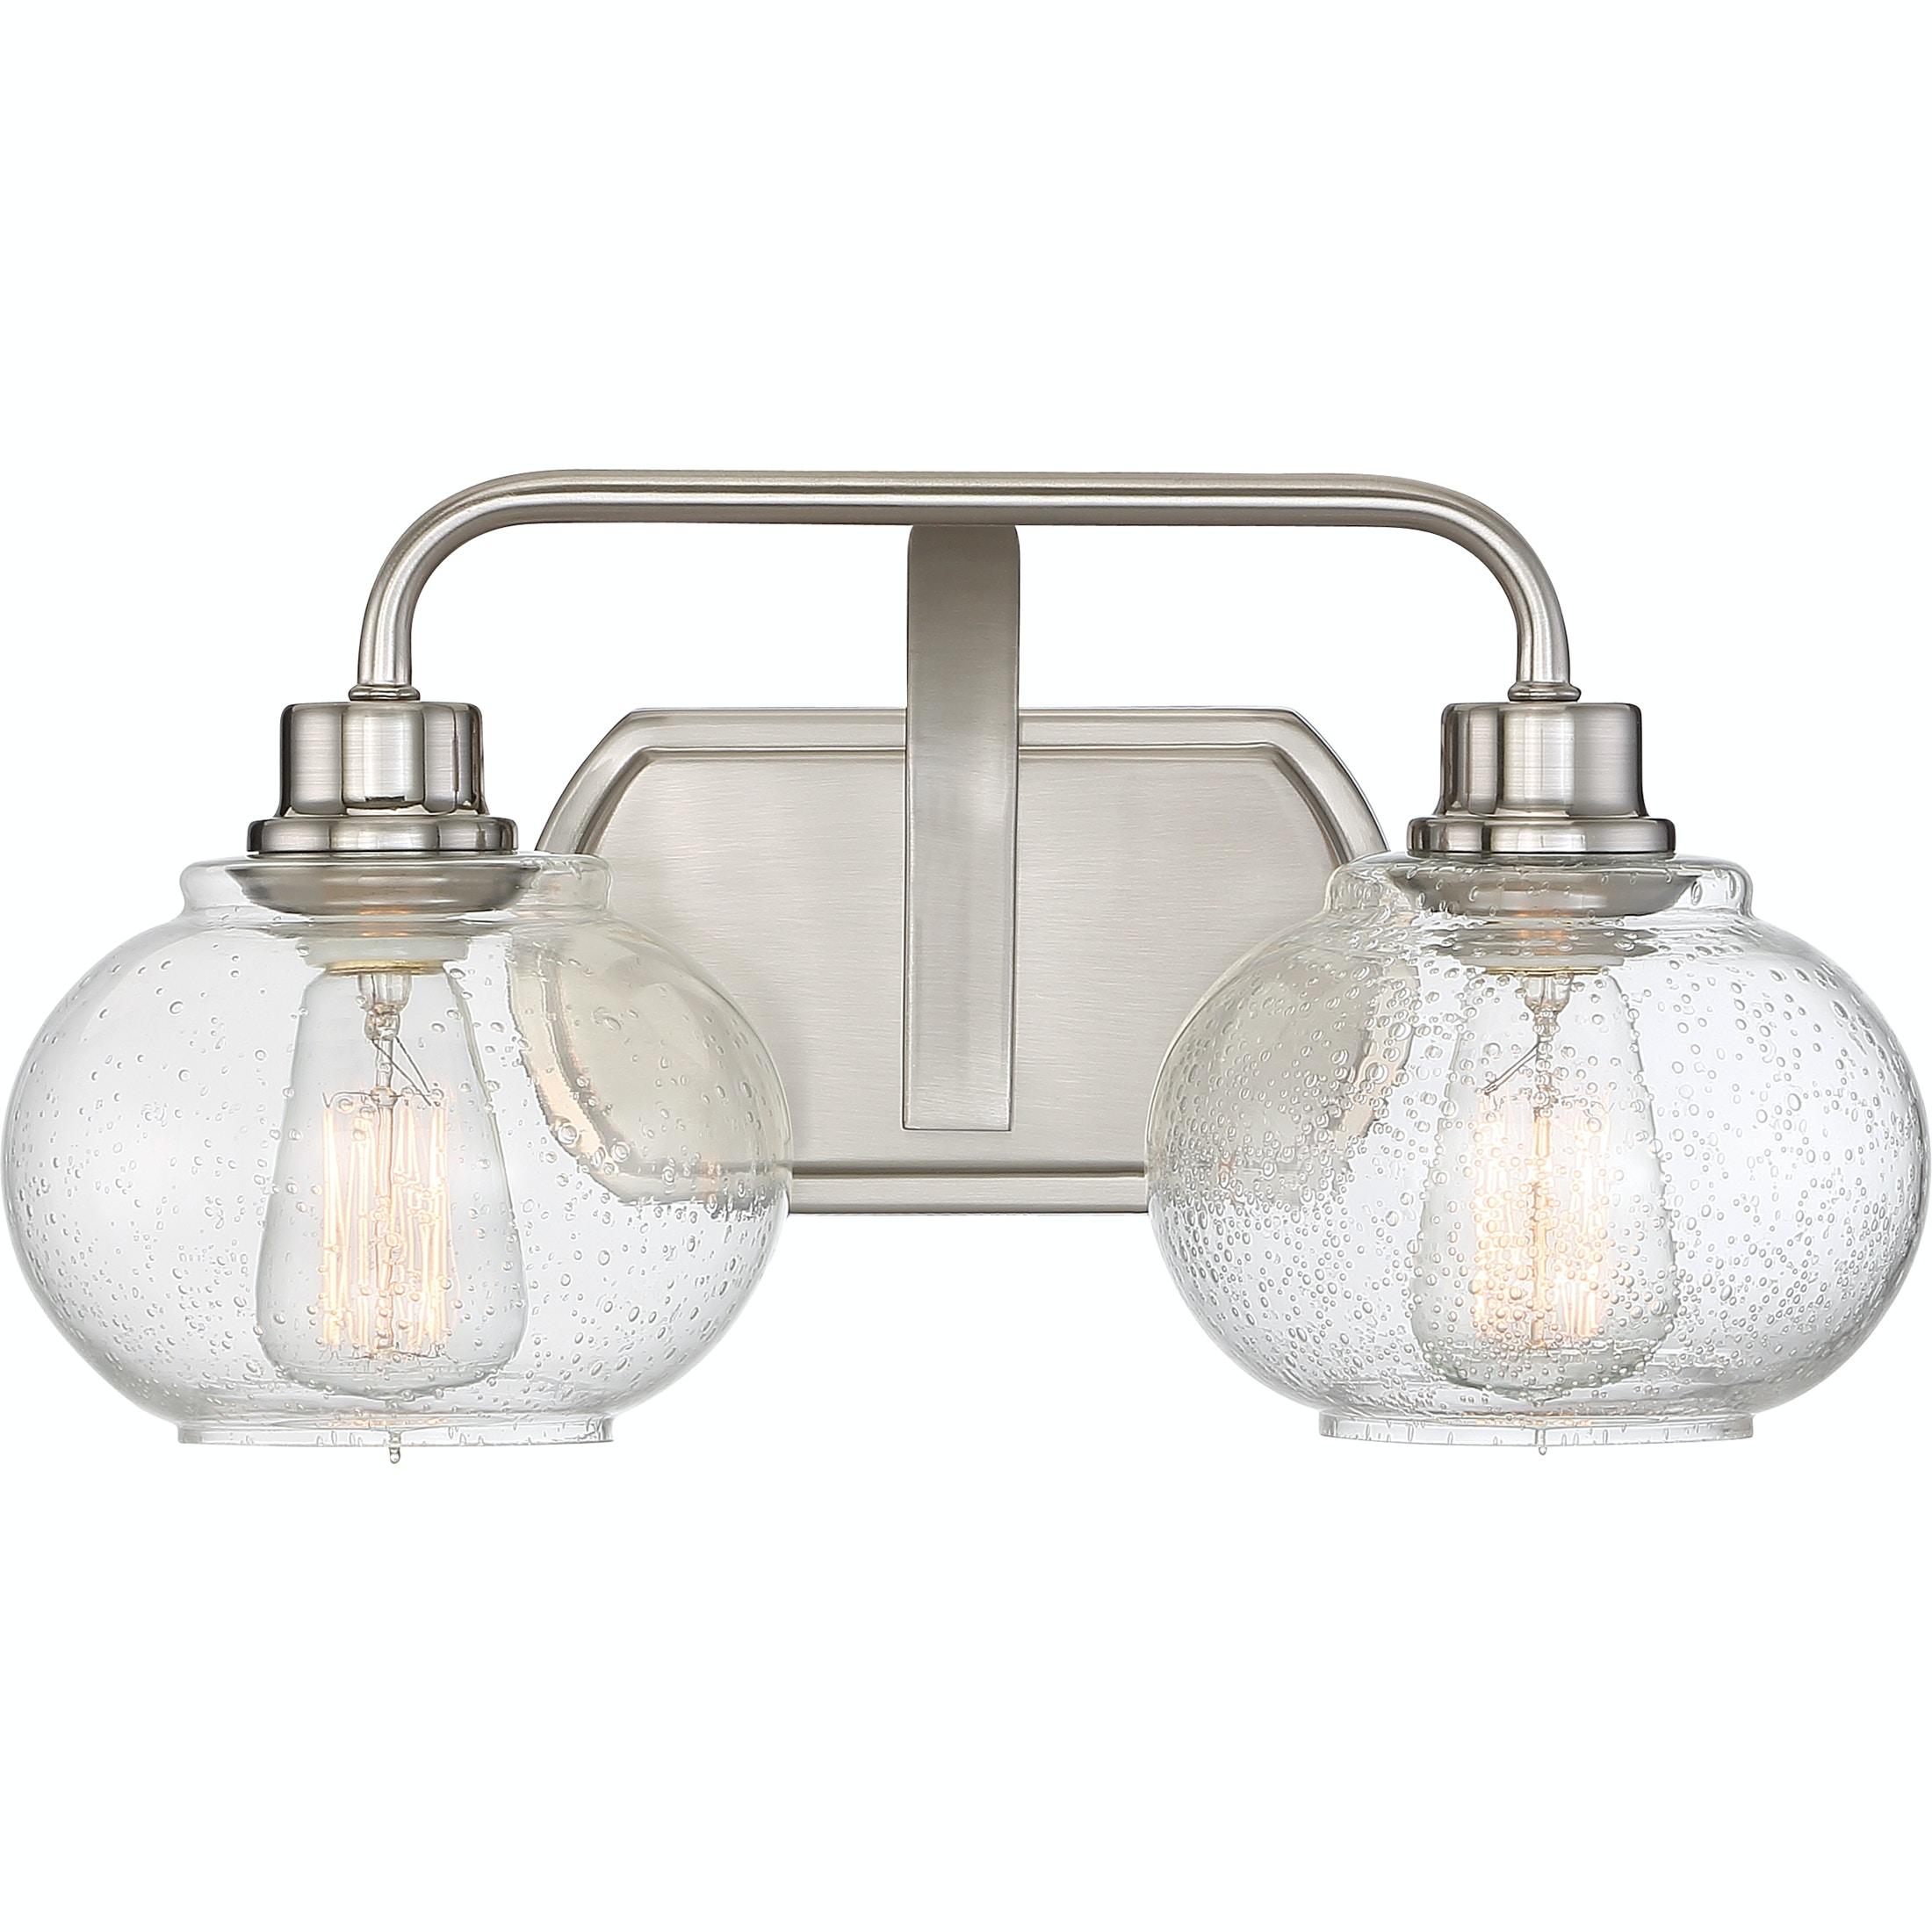 quoizel bathroom lighting antique nickel quoizel bath light trg8602bn trg8602bn interiors camp hill lancaster